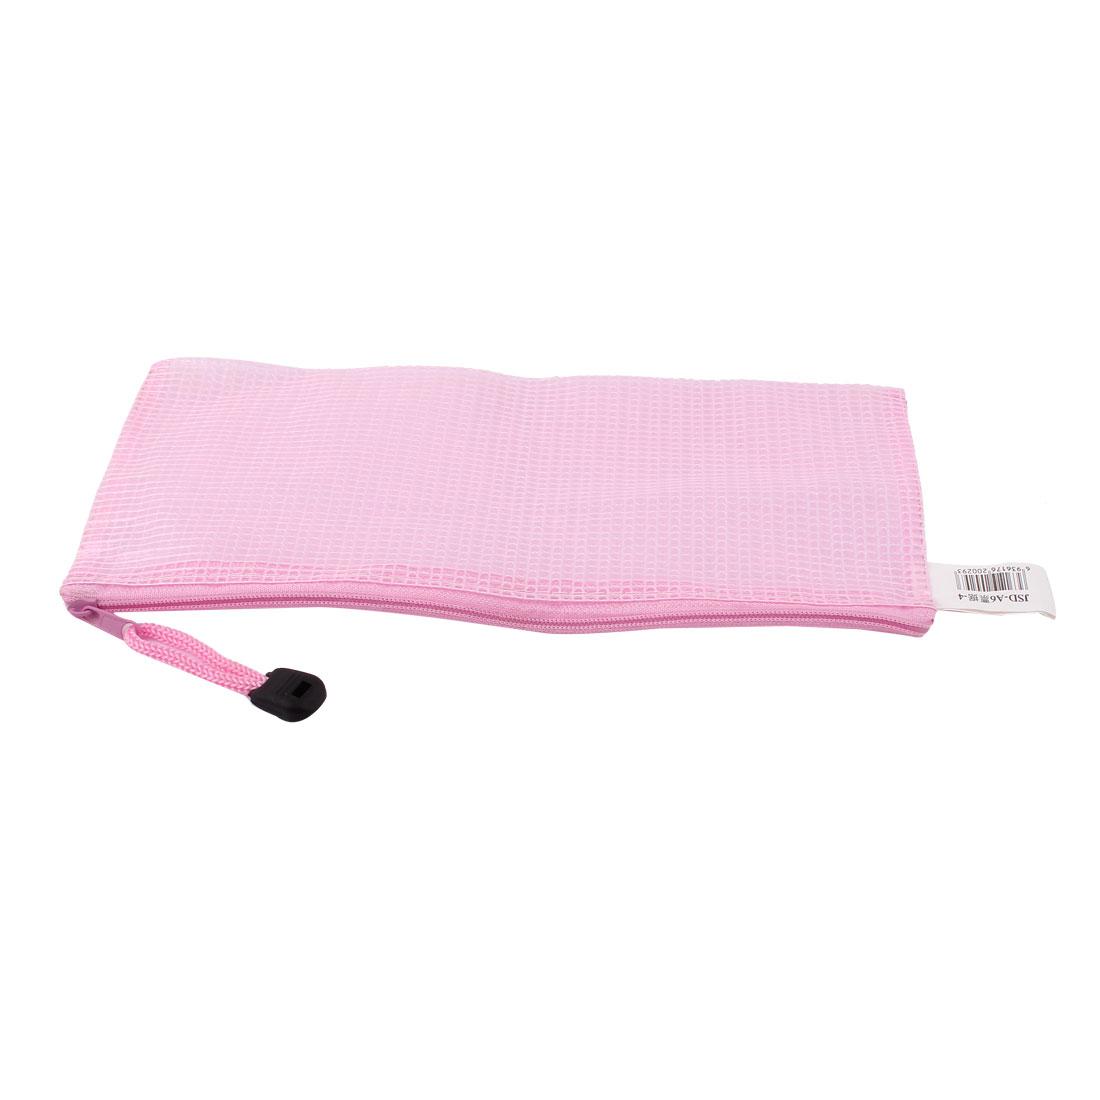 Zipper Closure PVC Mesh A6 Paper Document File Storage Bag Organizer Holder Pouch Pink